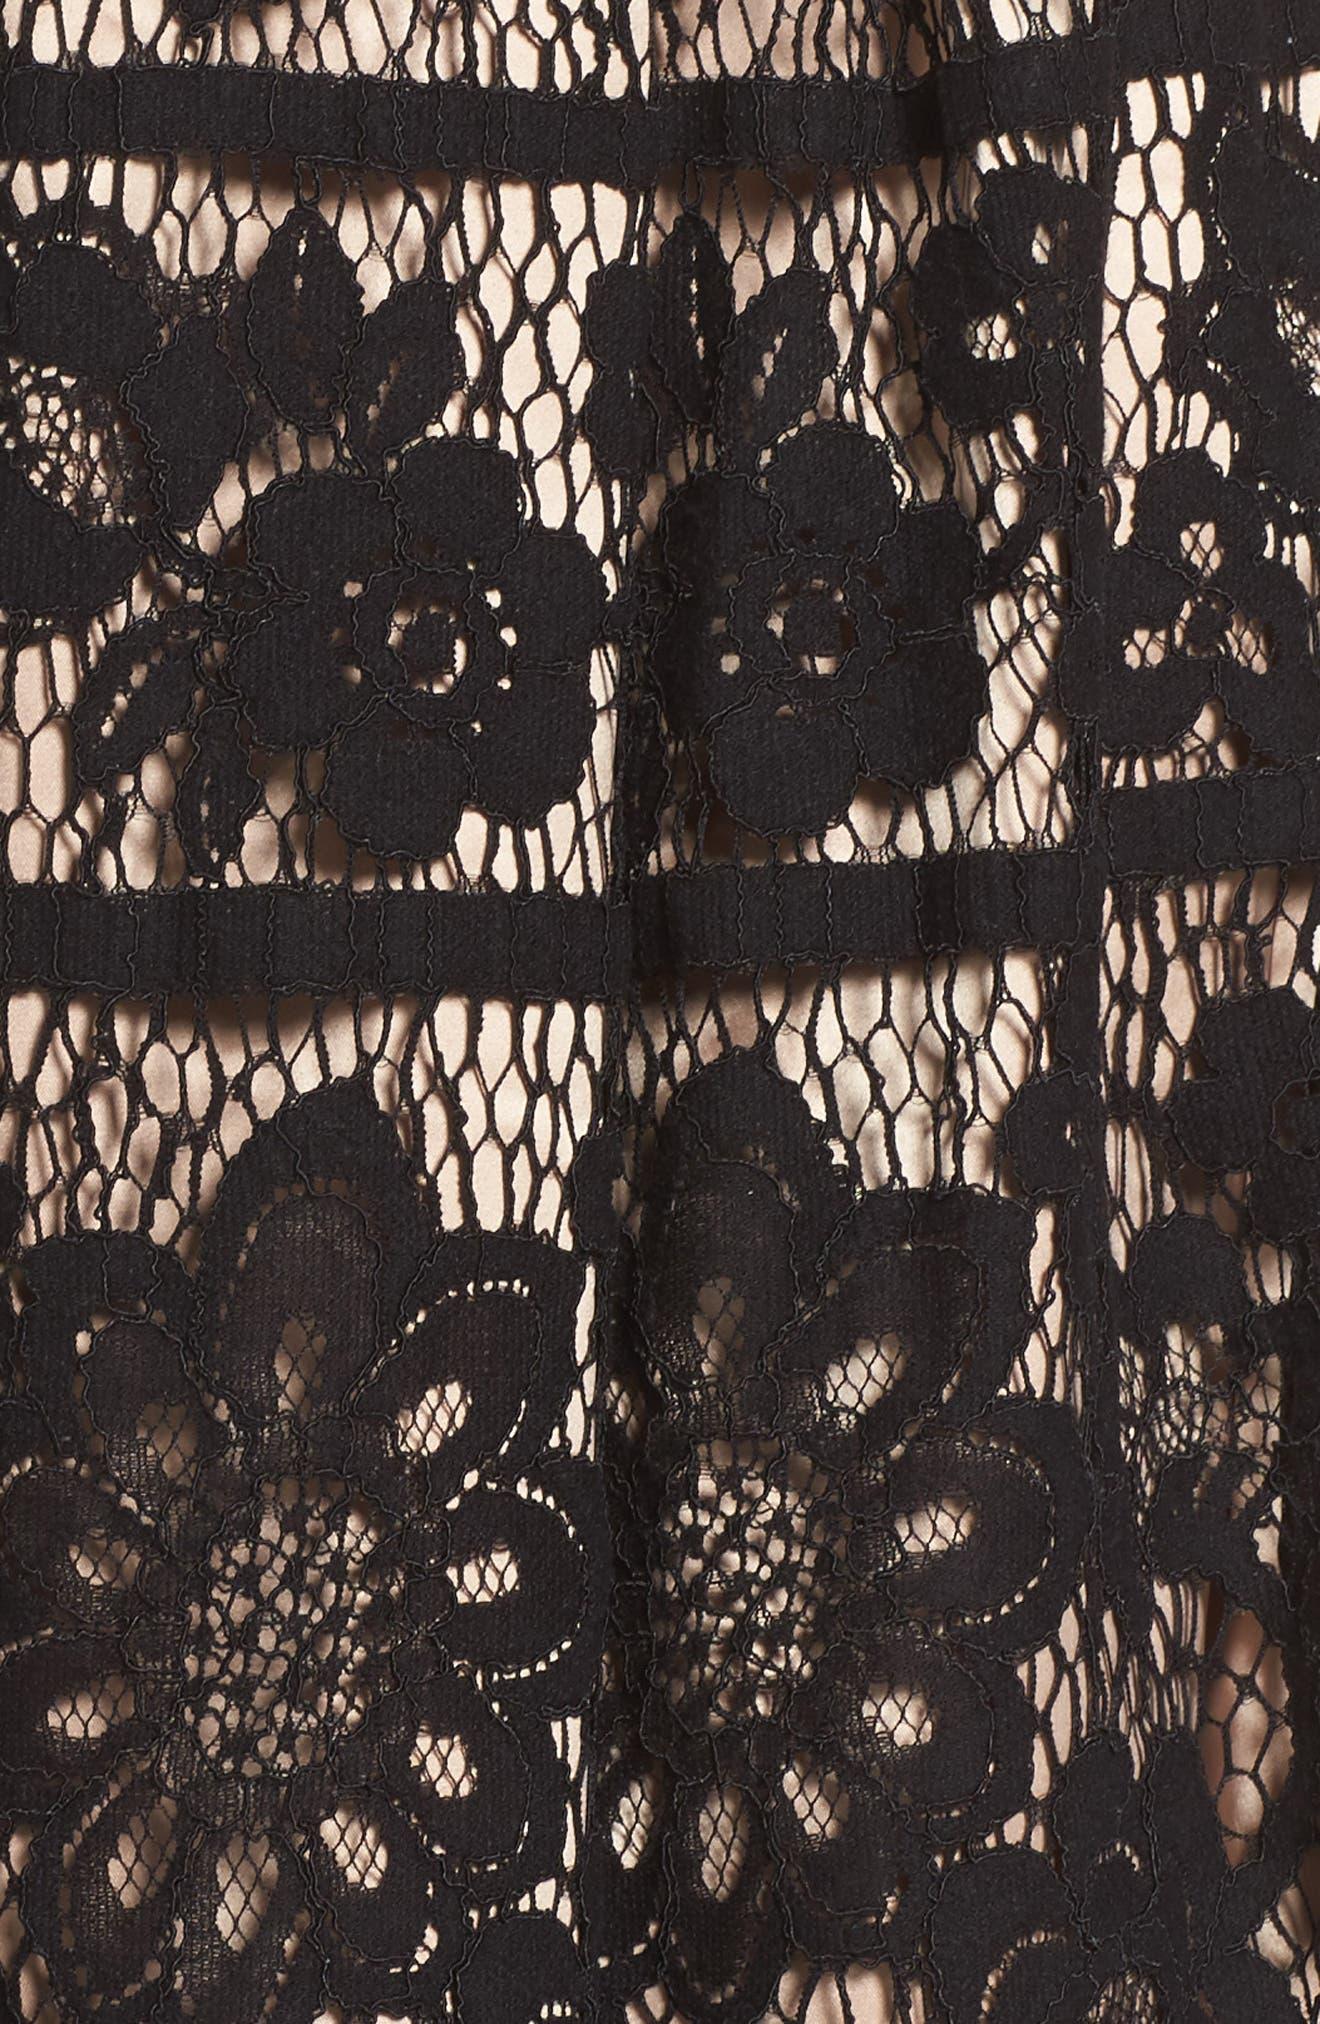 Pleated Lace Skirt,                             Alternate thumbnail 5, color,                             Black/ Nude